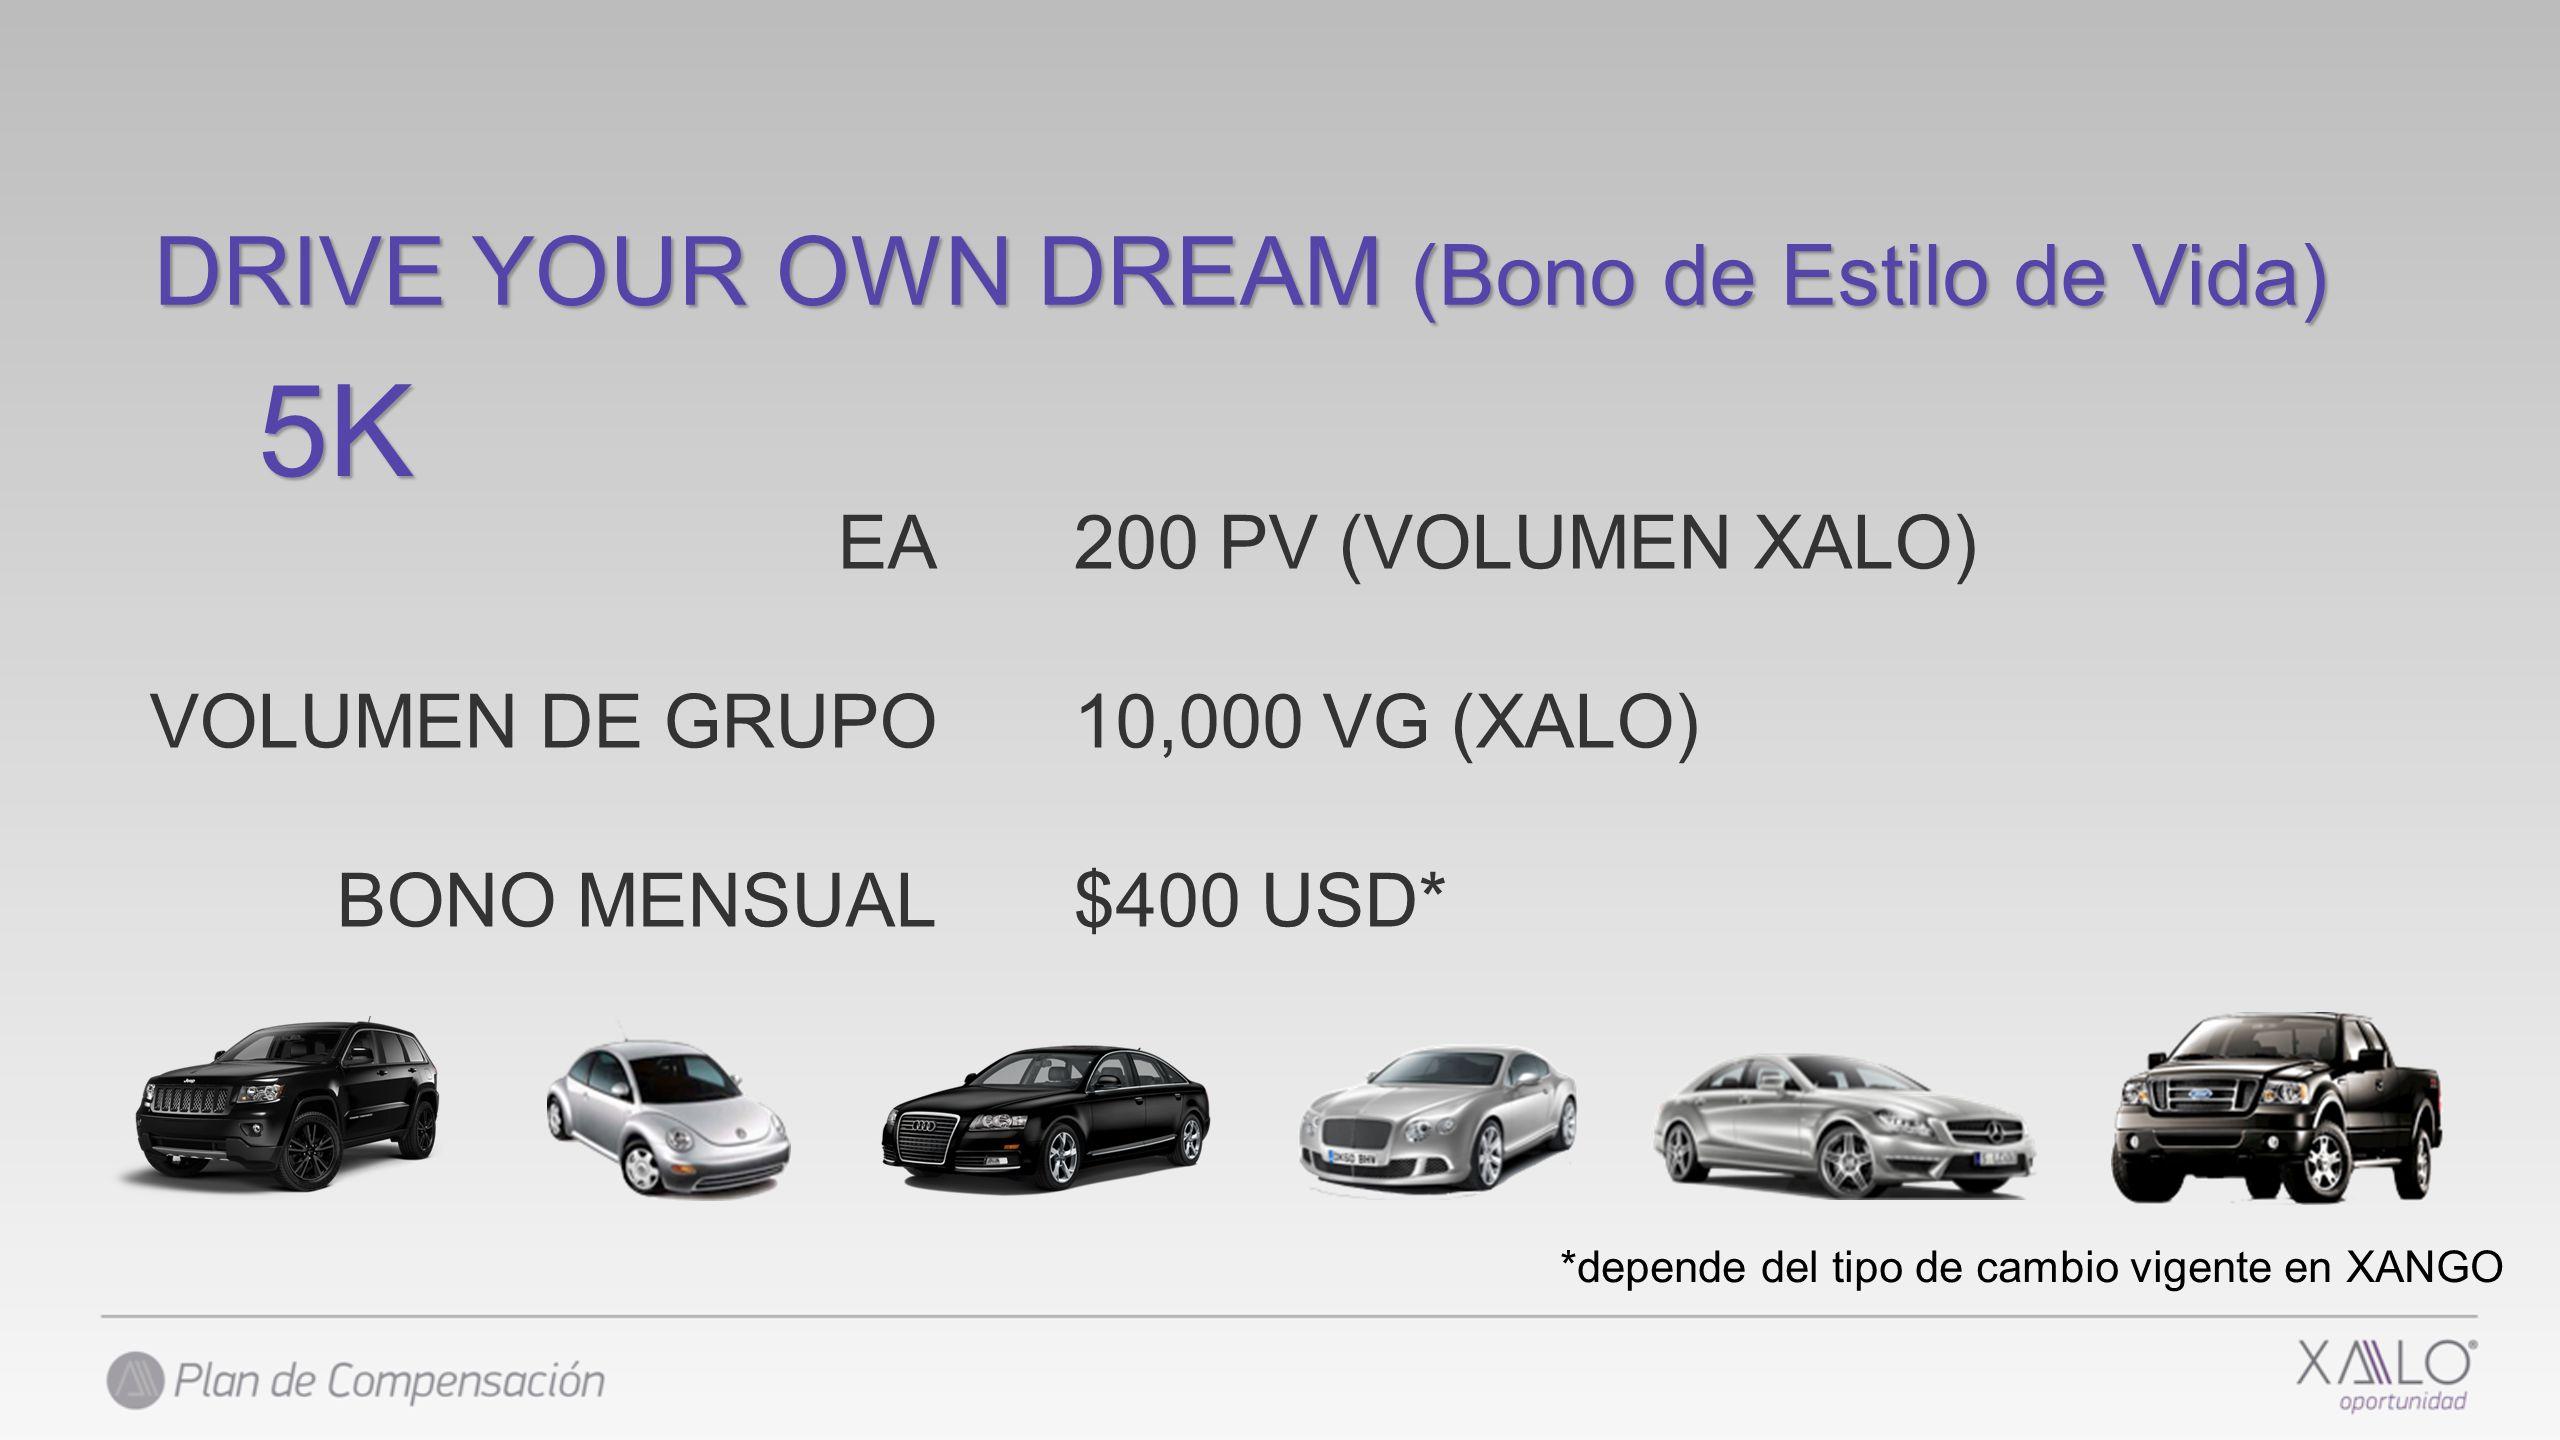 DRIVE YOUR OWN DREAM (Bono de Estilo de Vida) EA VOLUMEN DE GRUPO BONO MENSUAL 200 PV (VOLUMEN XALO) 10,000 VG (XALO) $400 USD* 5K *depende del tipo d